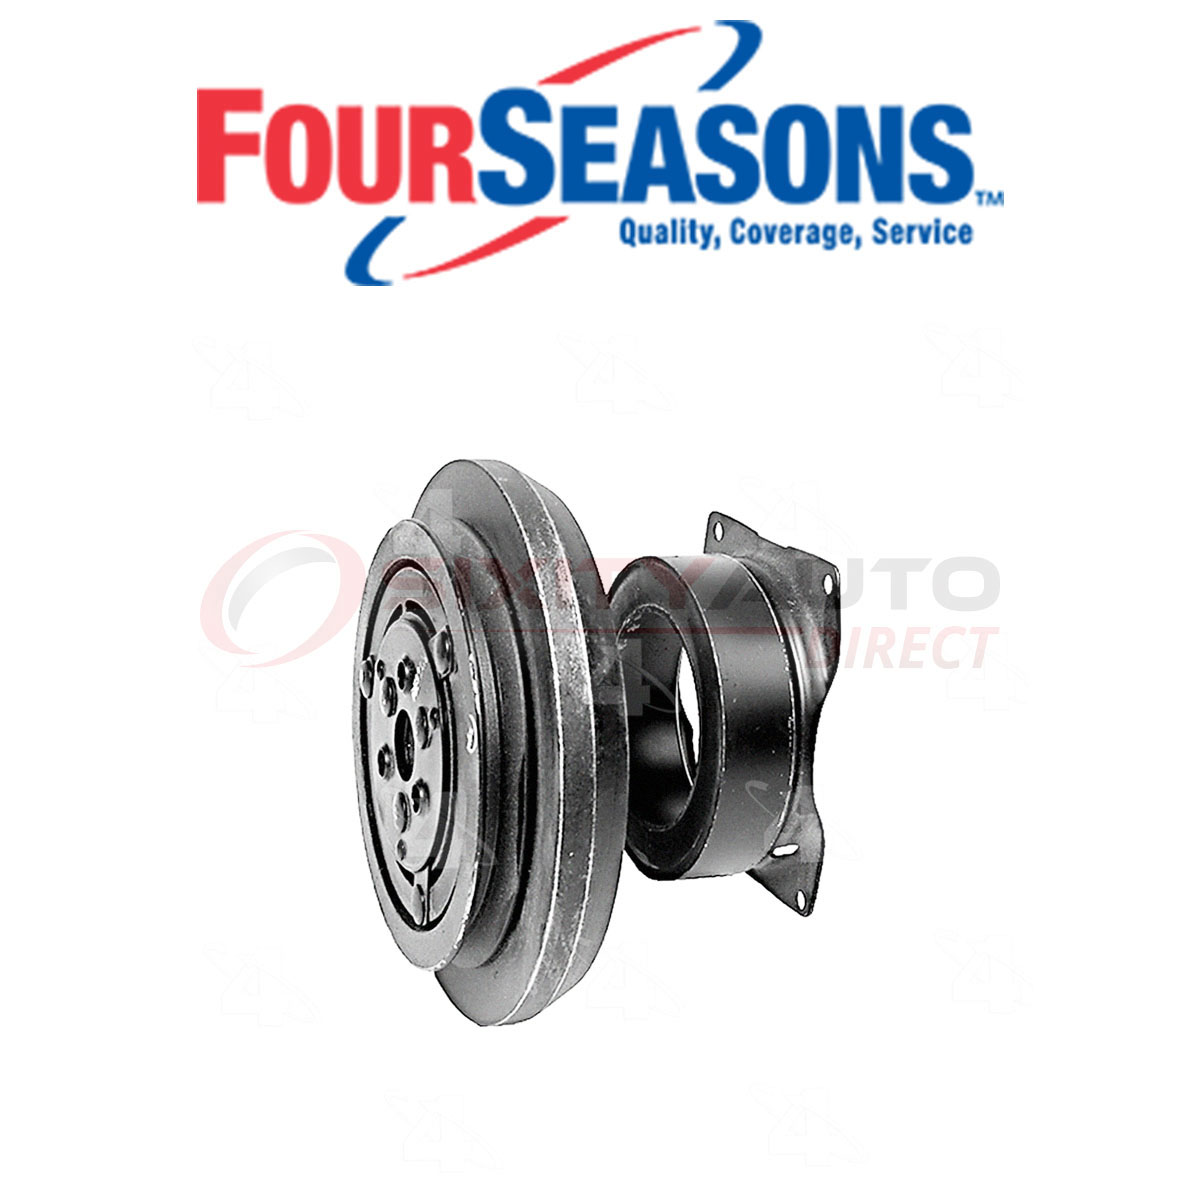 A//C Compressor Clutch-Clutch Assy 4 Seasons 48812 Reman